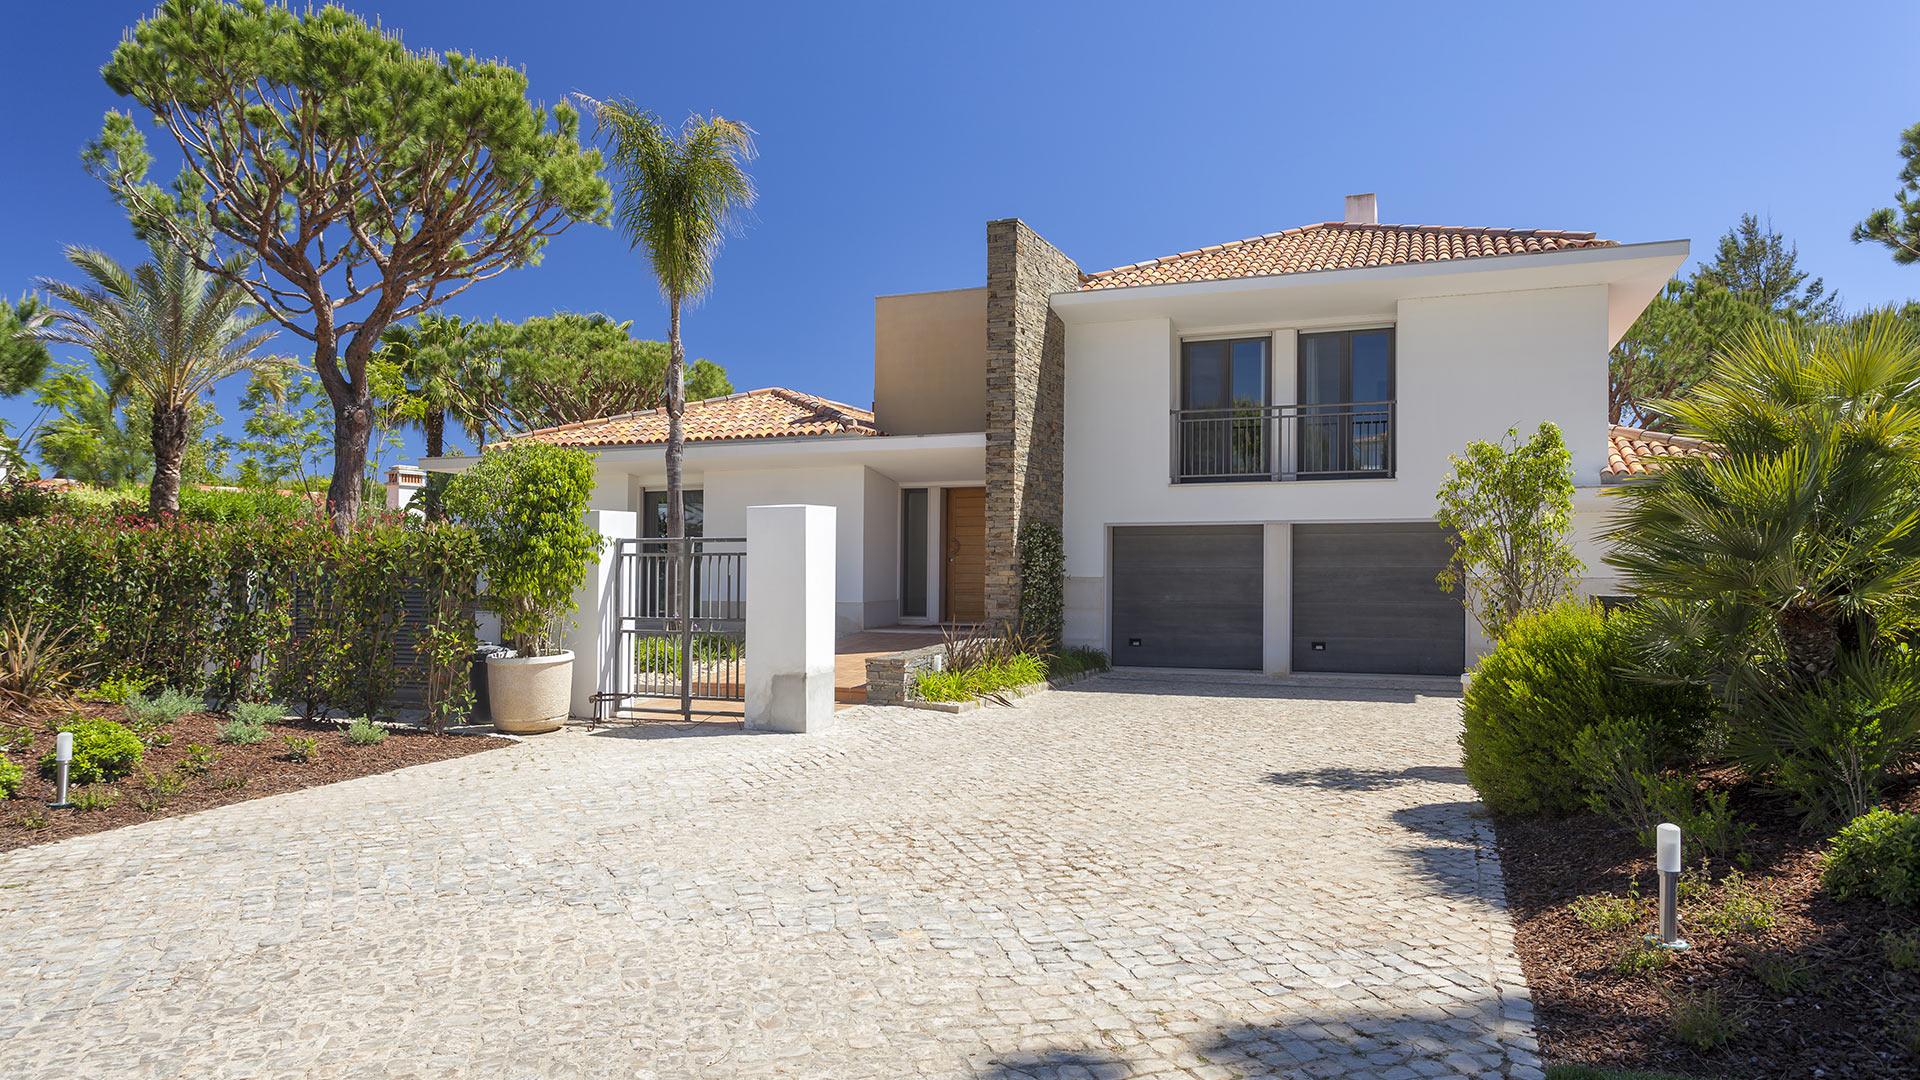 Villa Villa Giardina, Rental in Algarve